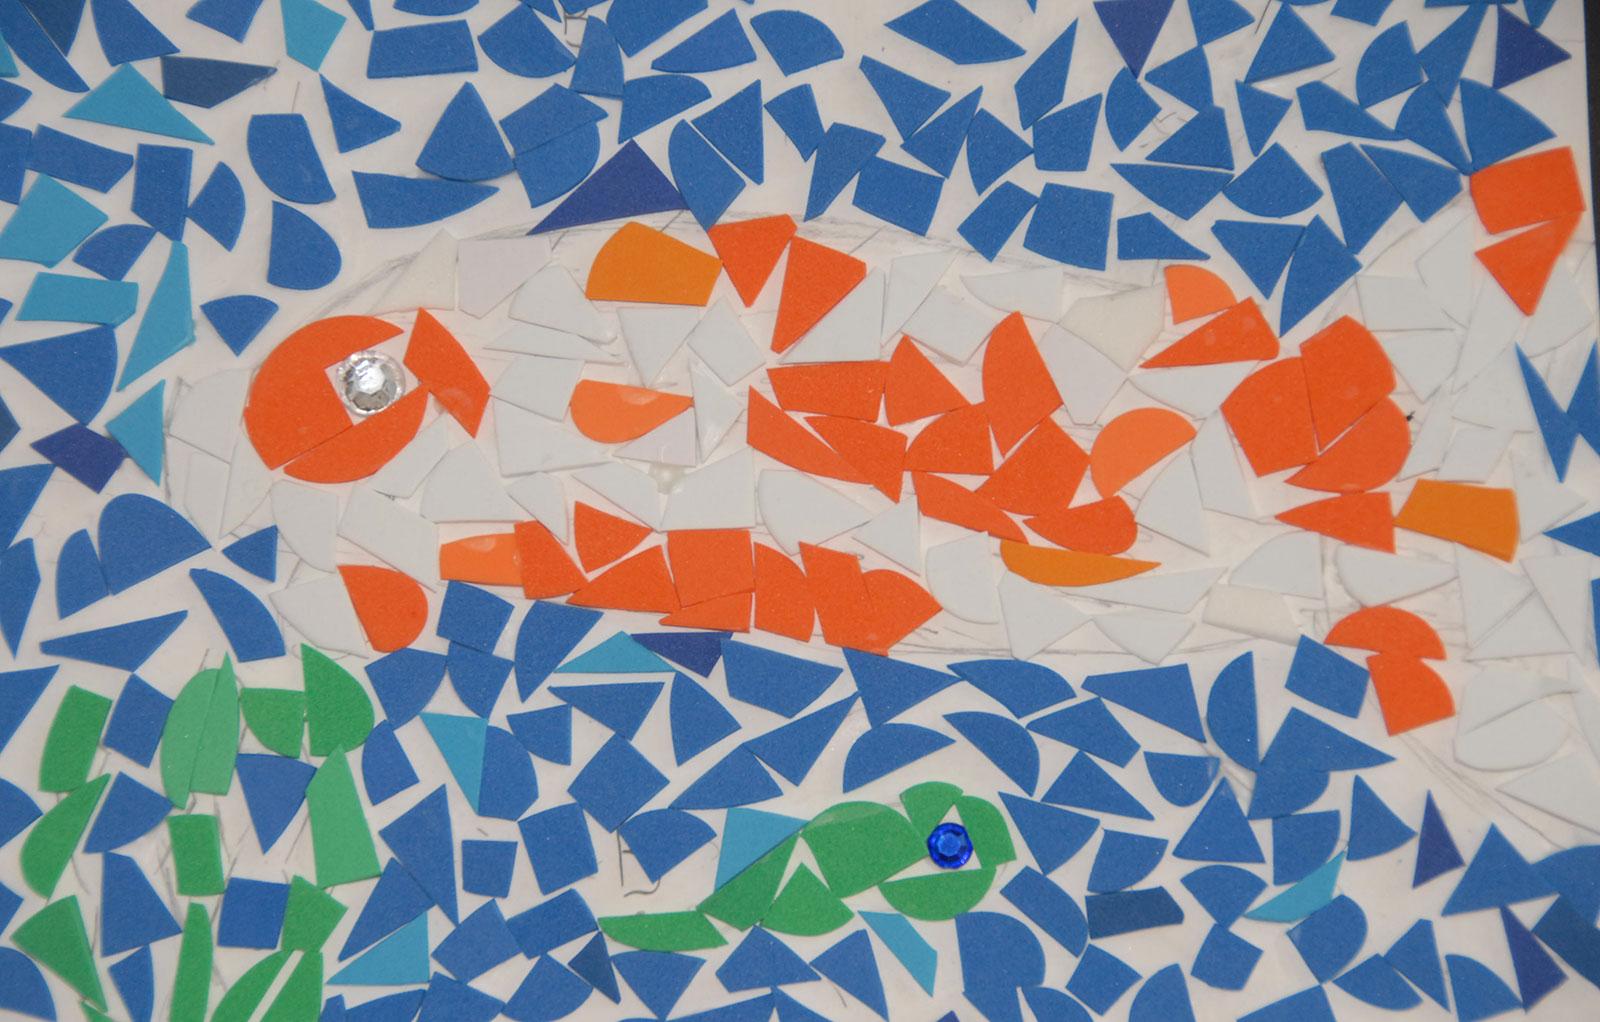 bridgefsfileVolumesUntitled 1ART Class 42012 Art Show Gallery__31.jpg